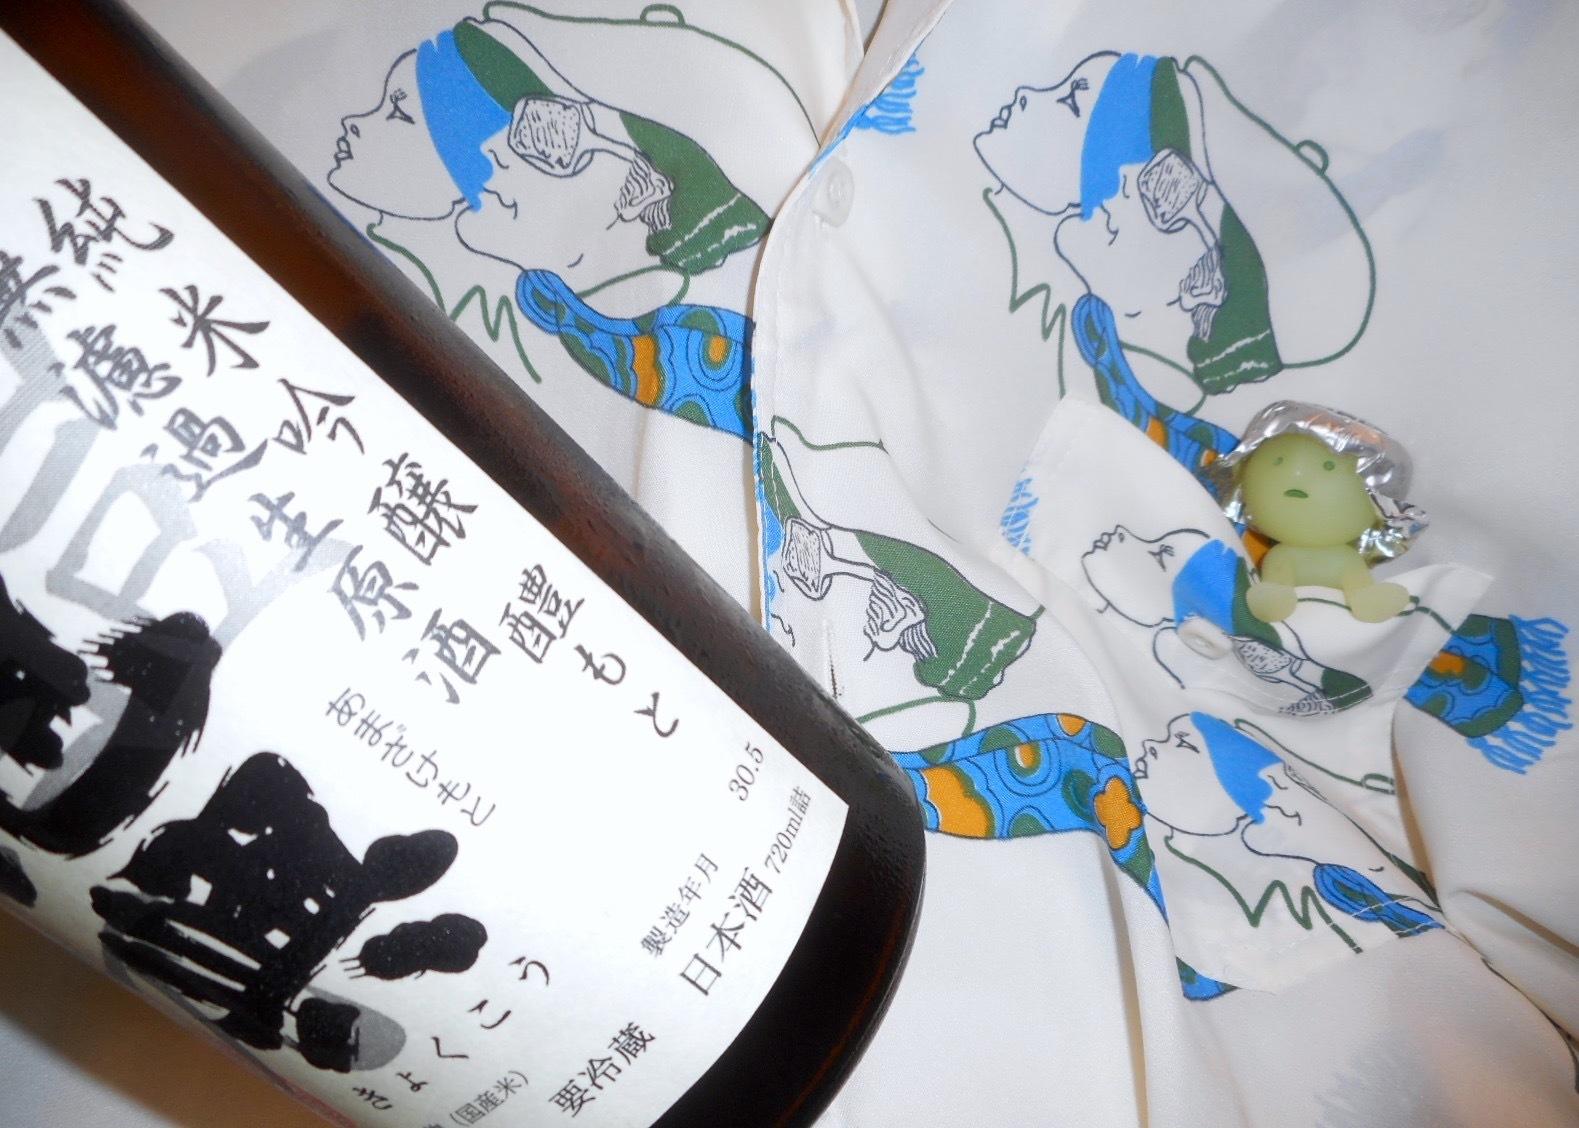 kyokukou_amazakemoto29by2b.jpg